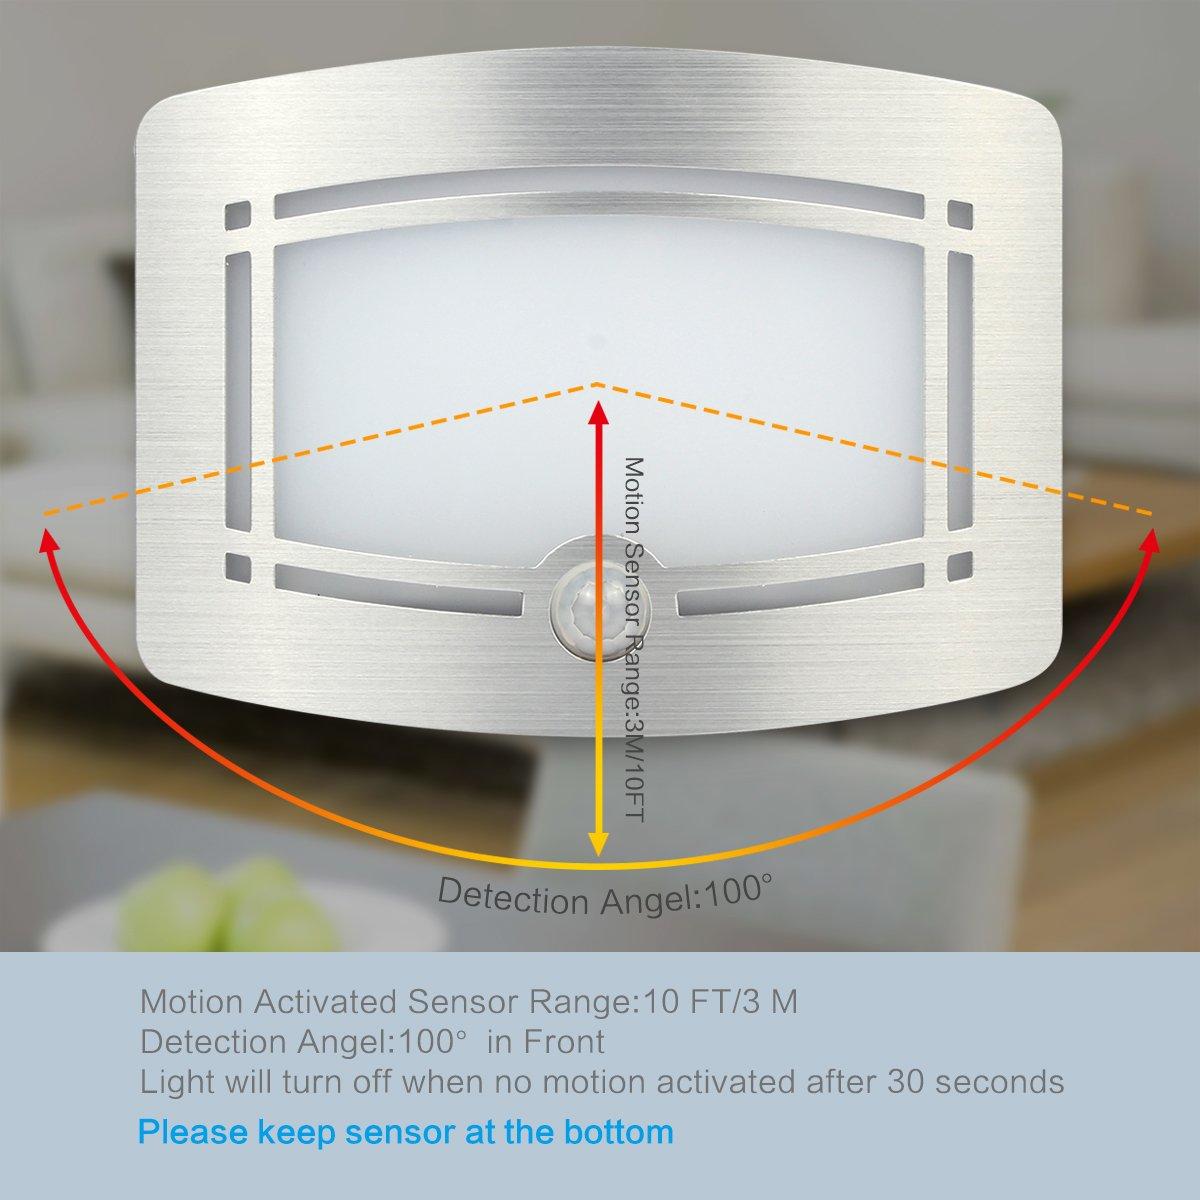 Motion Sensor LED Night Light,Wireless Battery Powered Wall Lamp,Stick Anywhere Wall Sconce,Aluminum Case Closet Light,Safe Light for Stair, Hallway,Bathrom,Bedroom,Kitchen by Kalefu (Image #3)